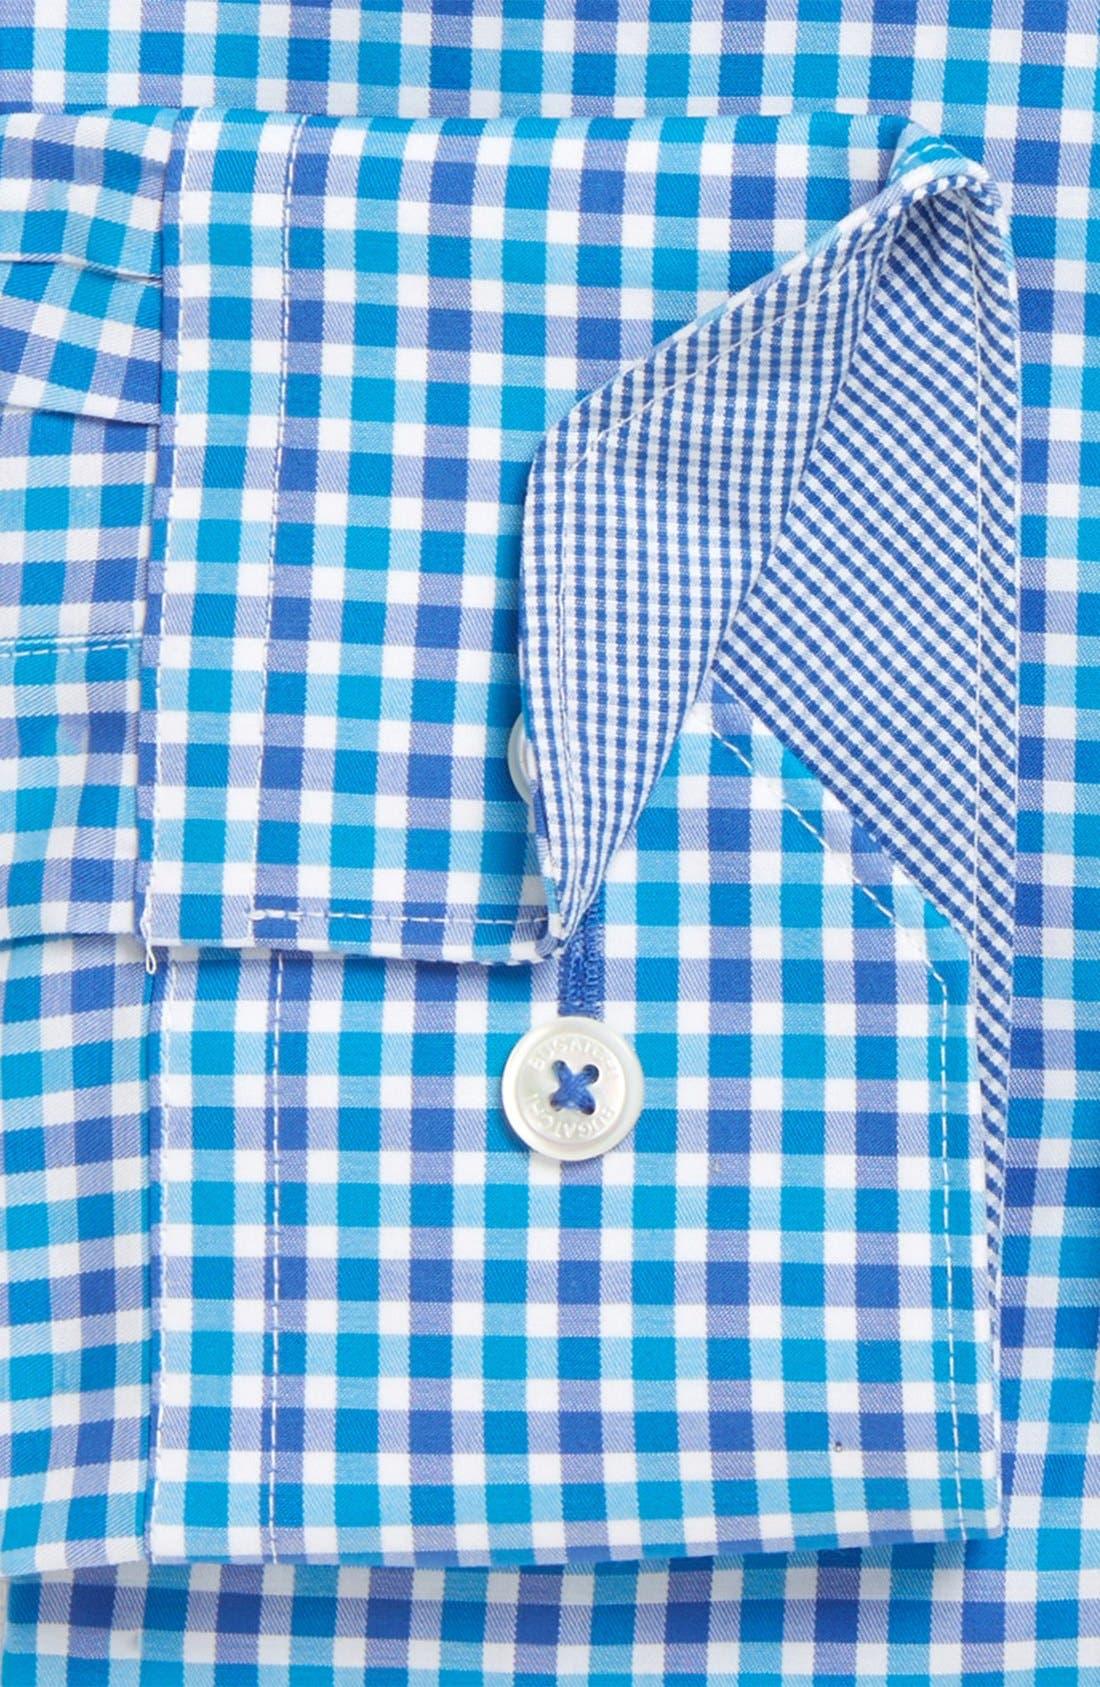 Trim Fit Check Dress Shirt,                             Alternate thumbnail 2, color,                             Turquoise